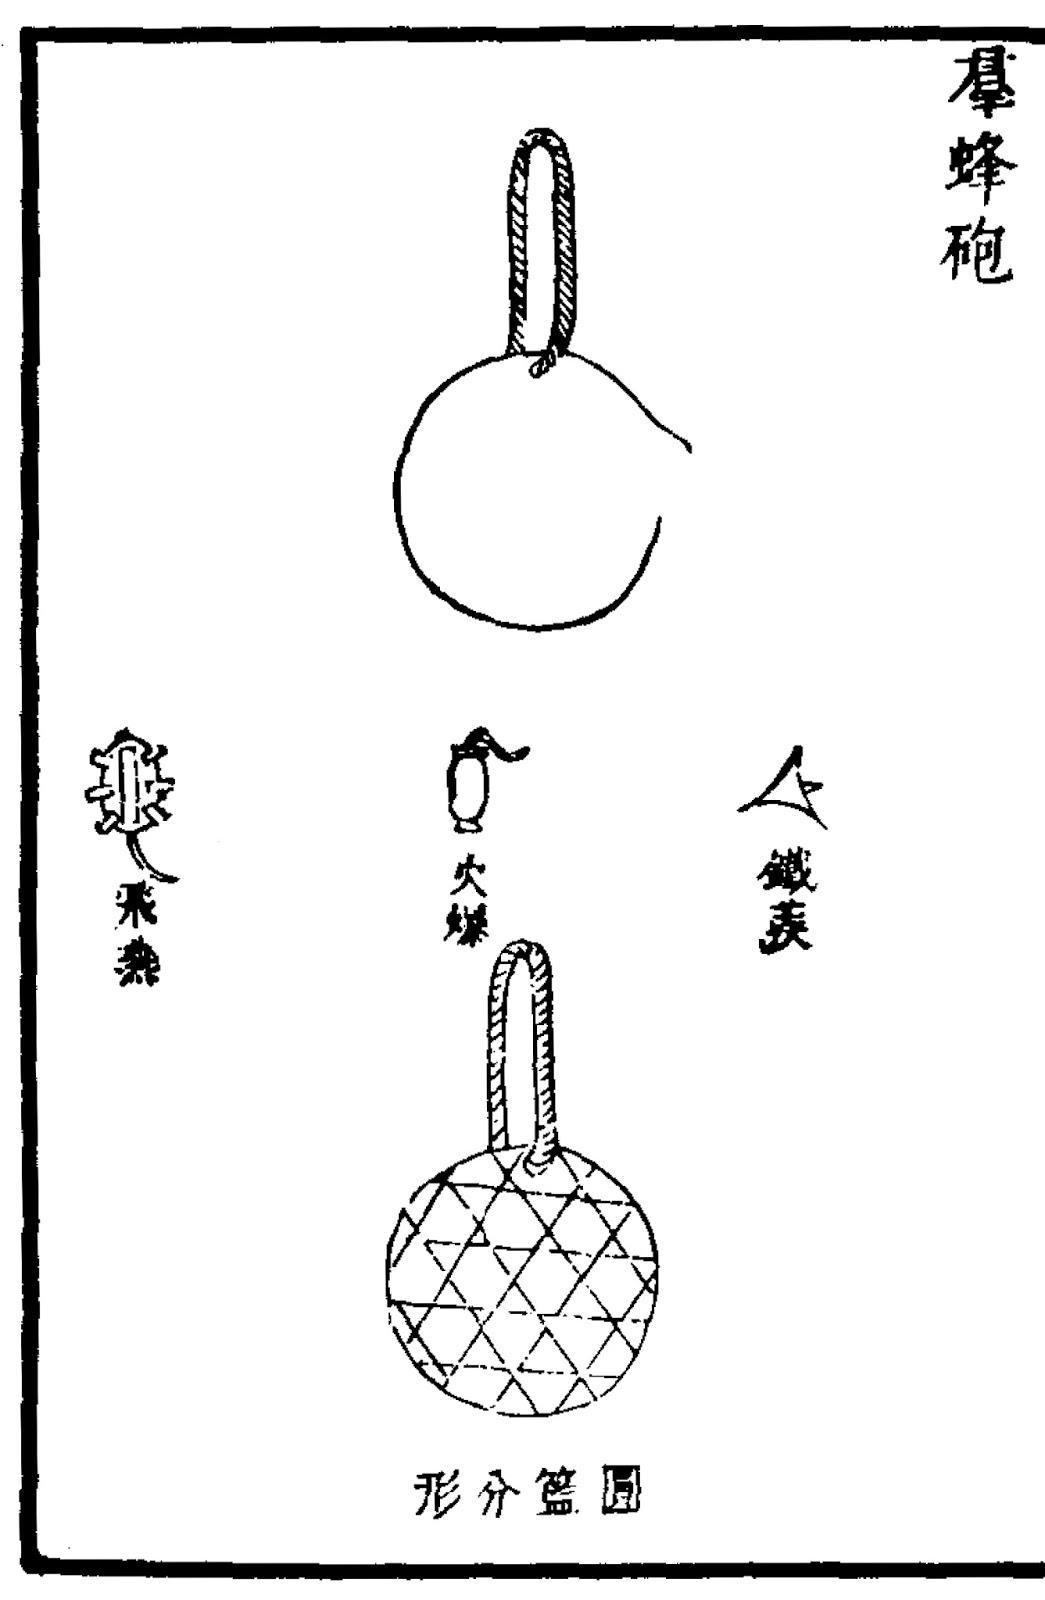 Qun Feng Pao